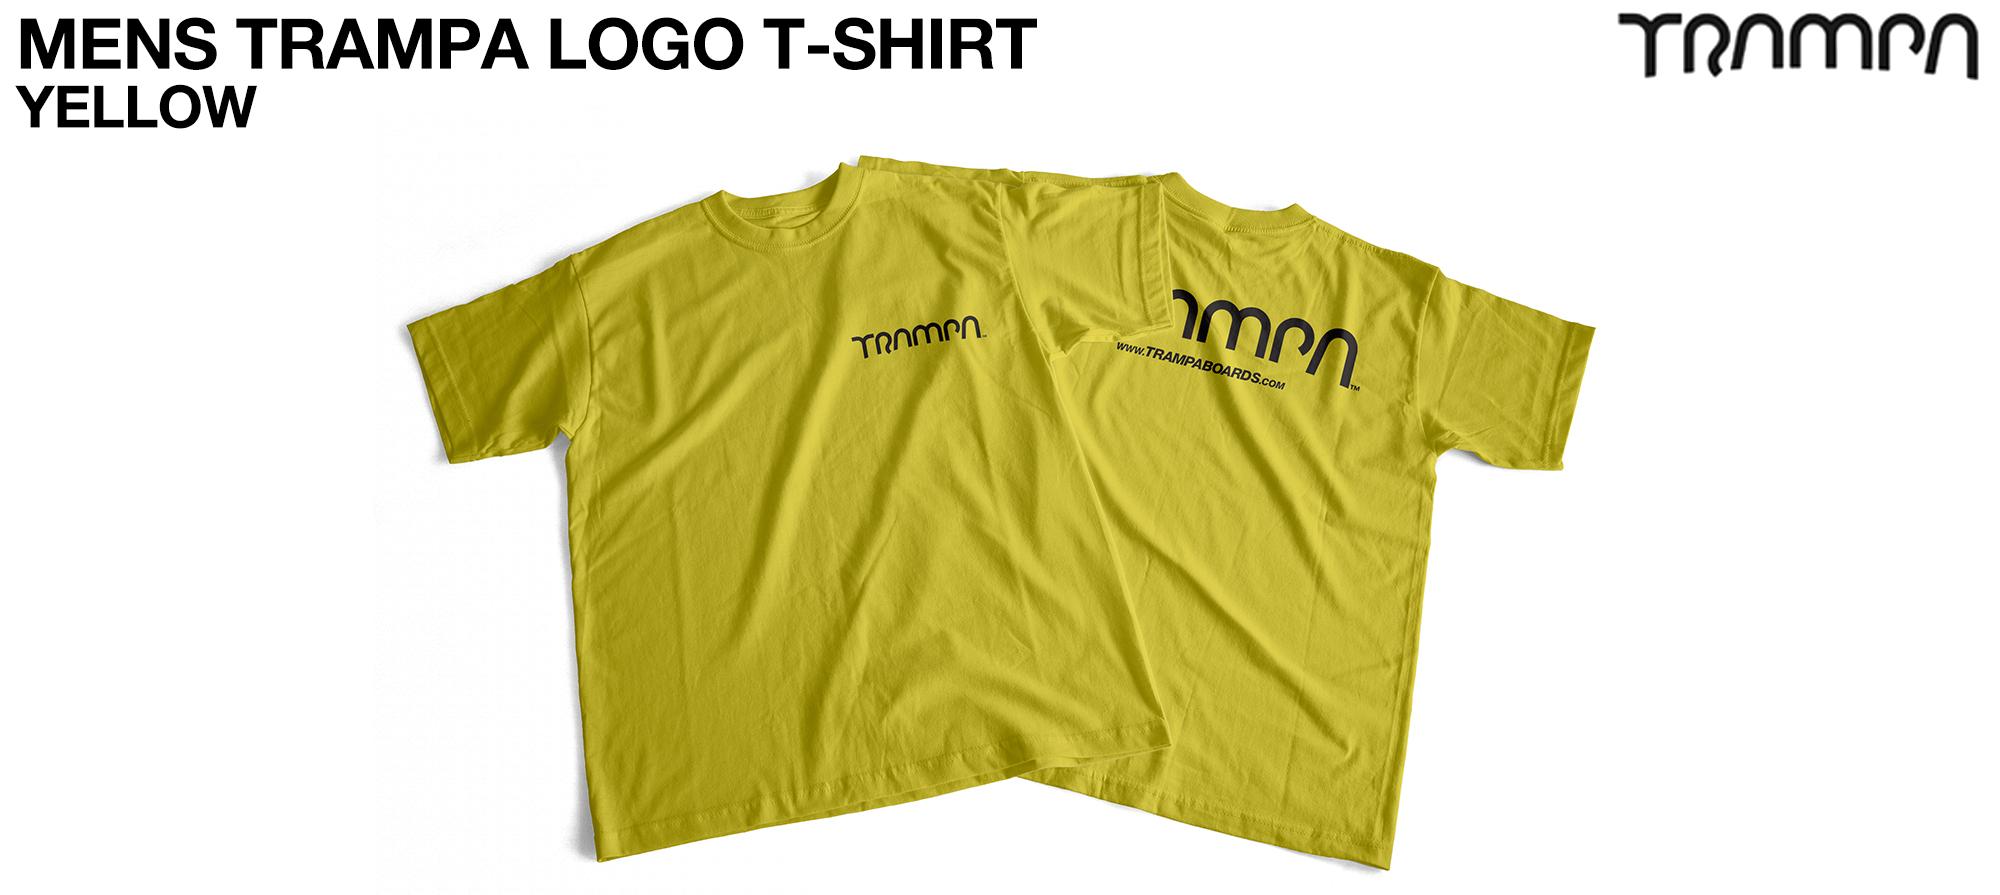 Gildan T  TRAMPA LOGO Yellow - CUSTOM